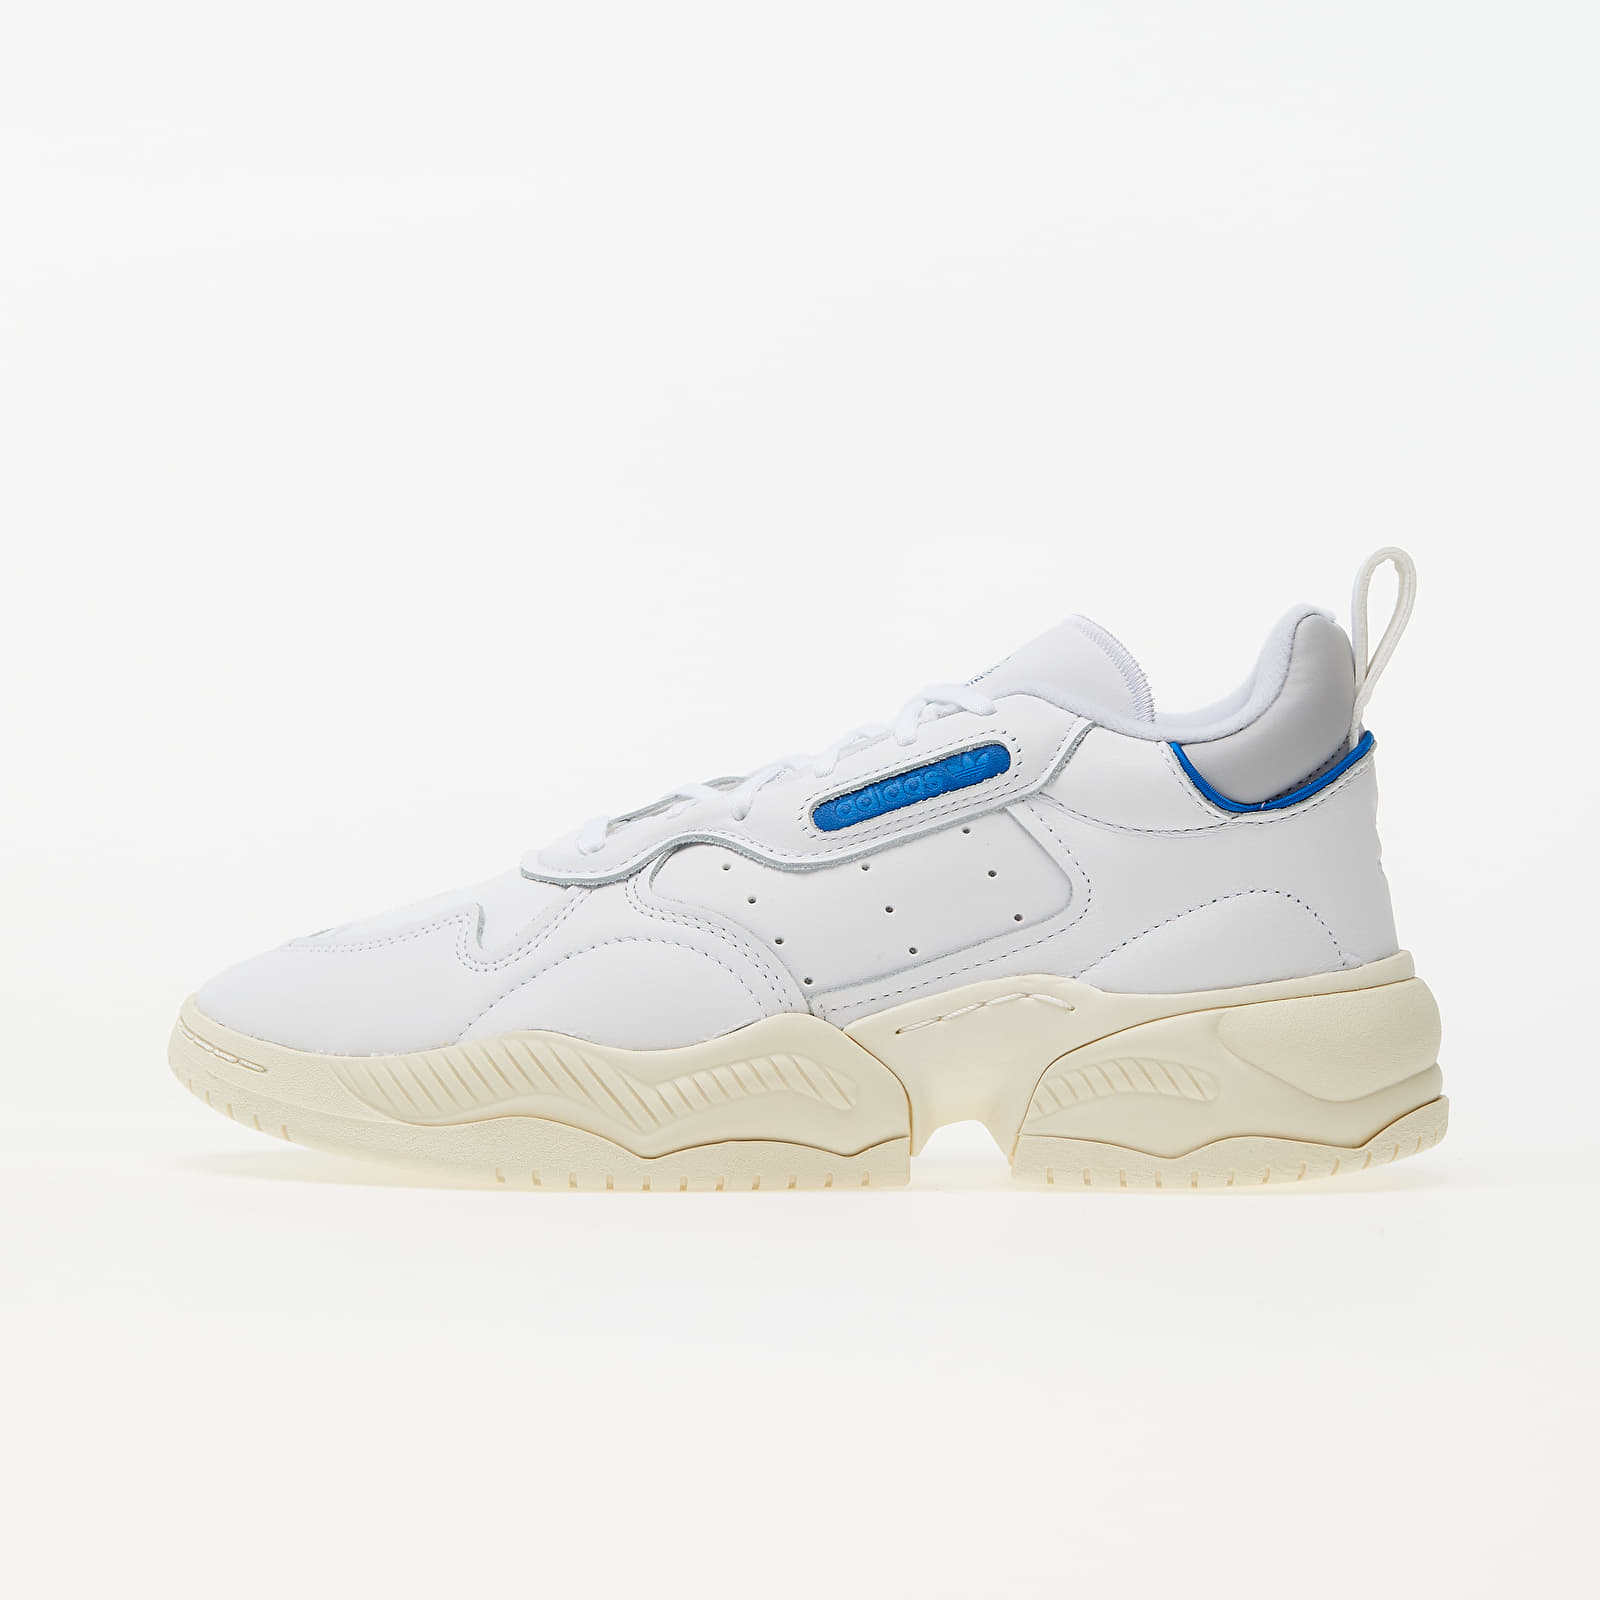 adidas Supercourt RX Ftw White/ Blue Bird/ Off White FW4413